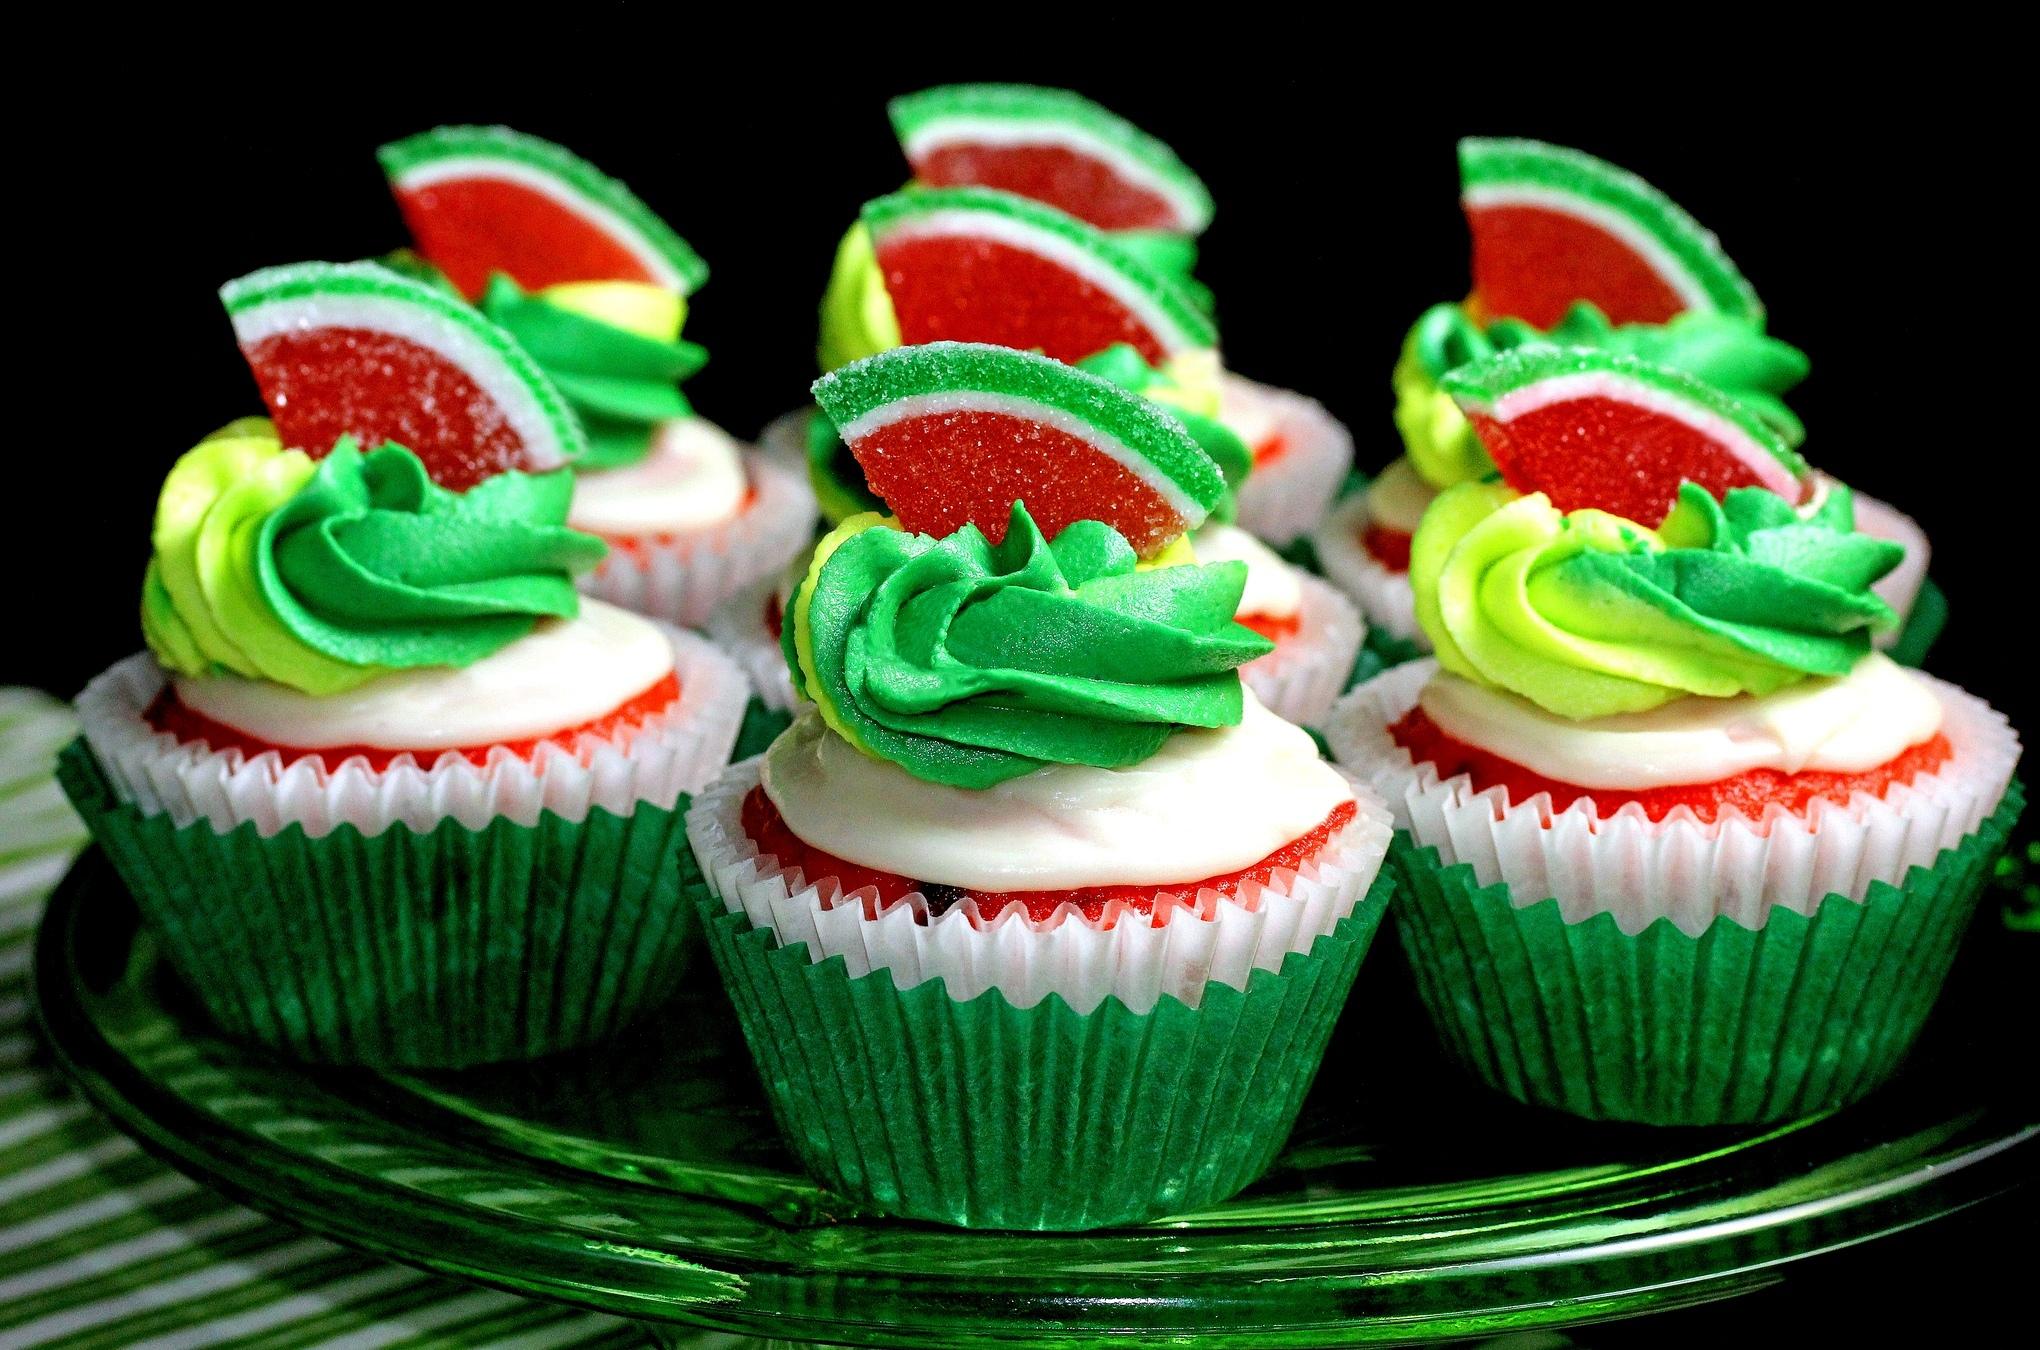 cupcake hd wallpaper | background image | 2040x1350 | id:434167